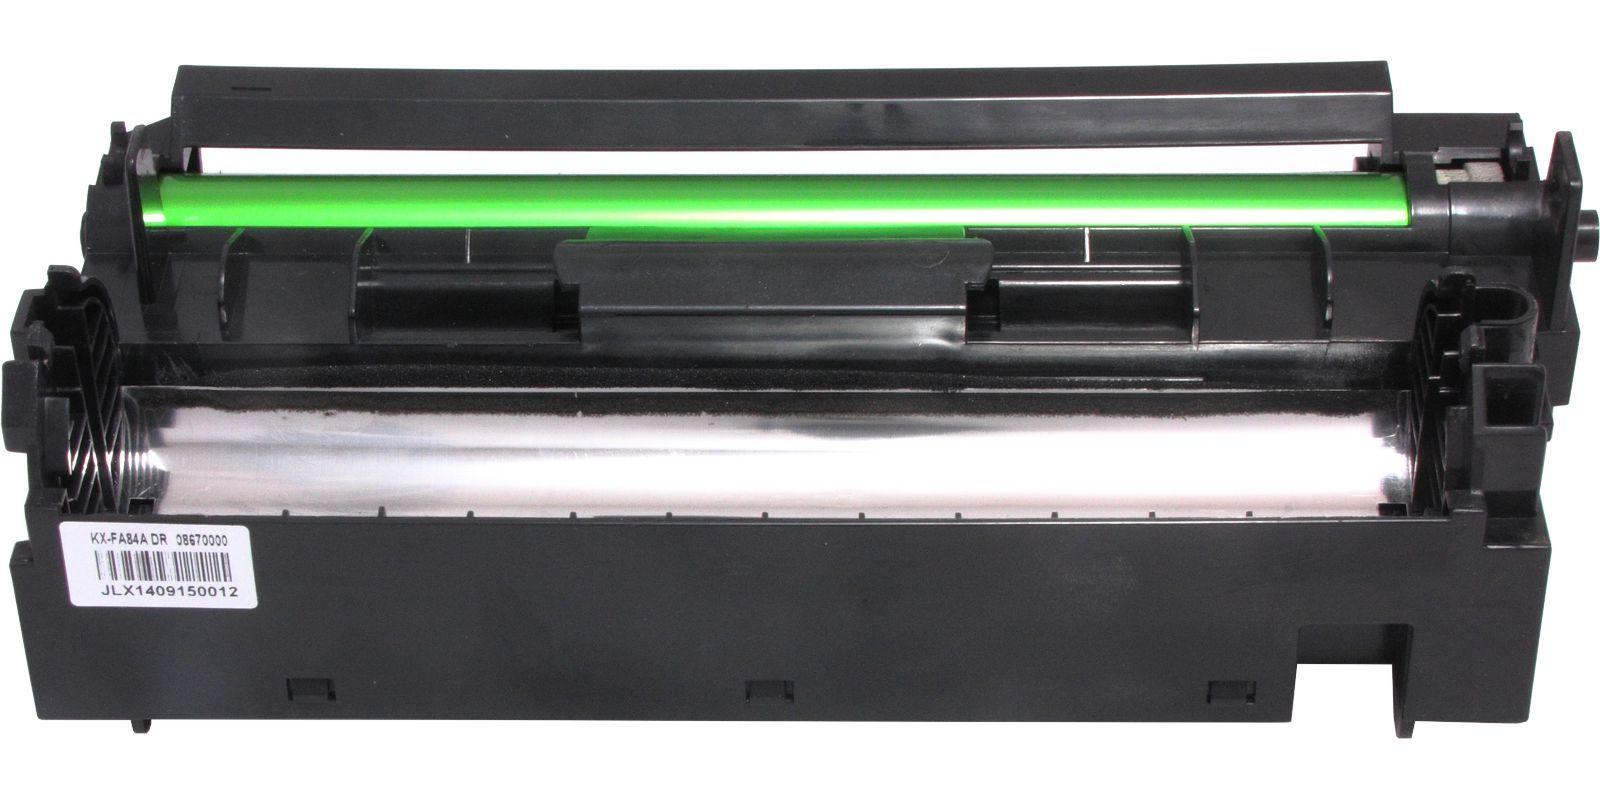 MAK KX-FA84A для Panasonic, DRUM Unit, черный, до 10000 стр.